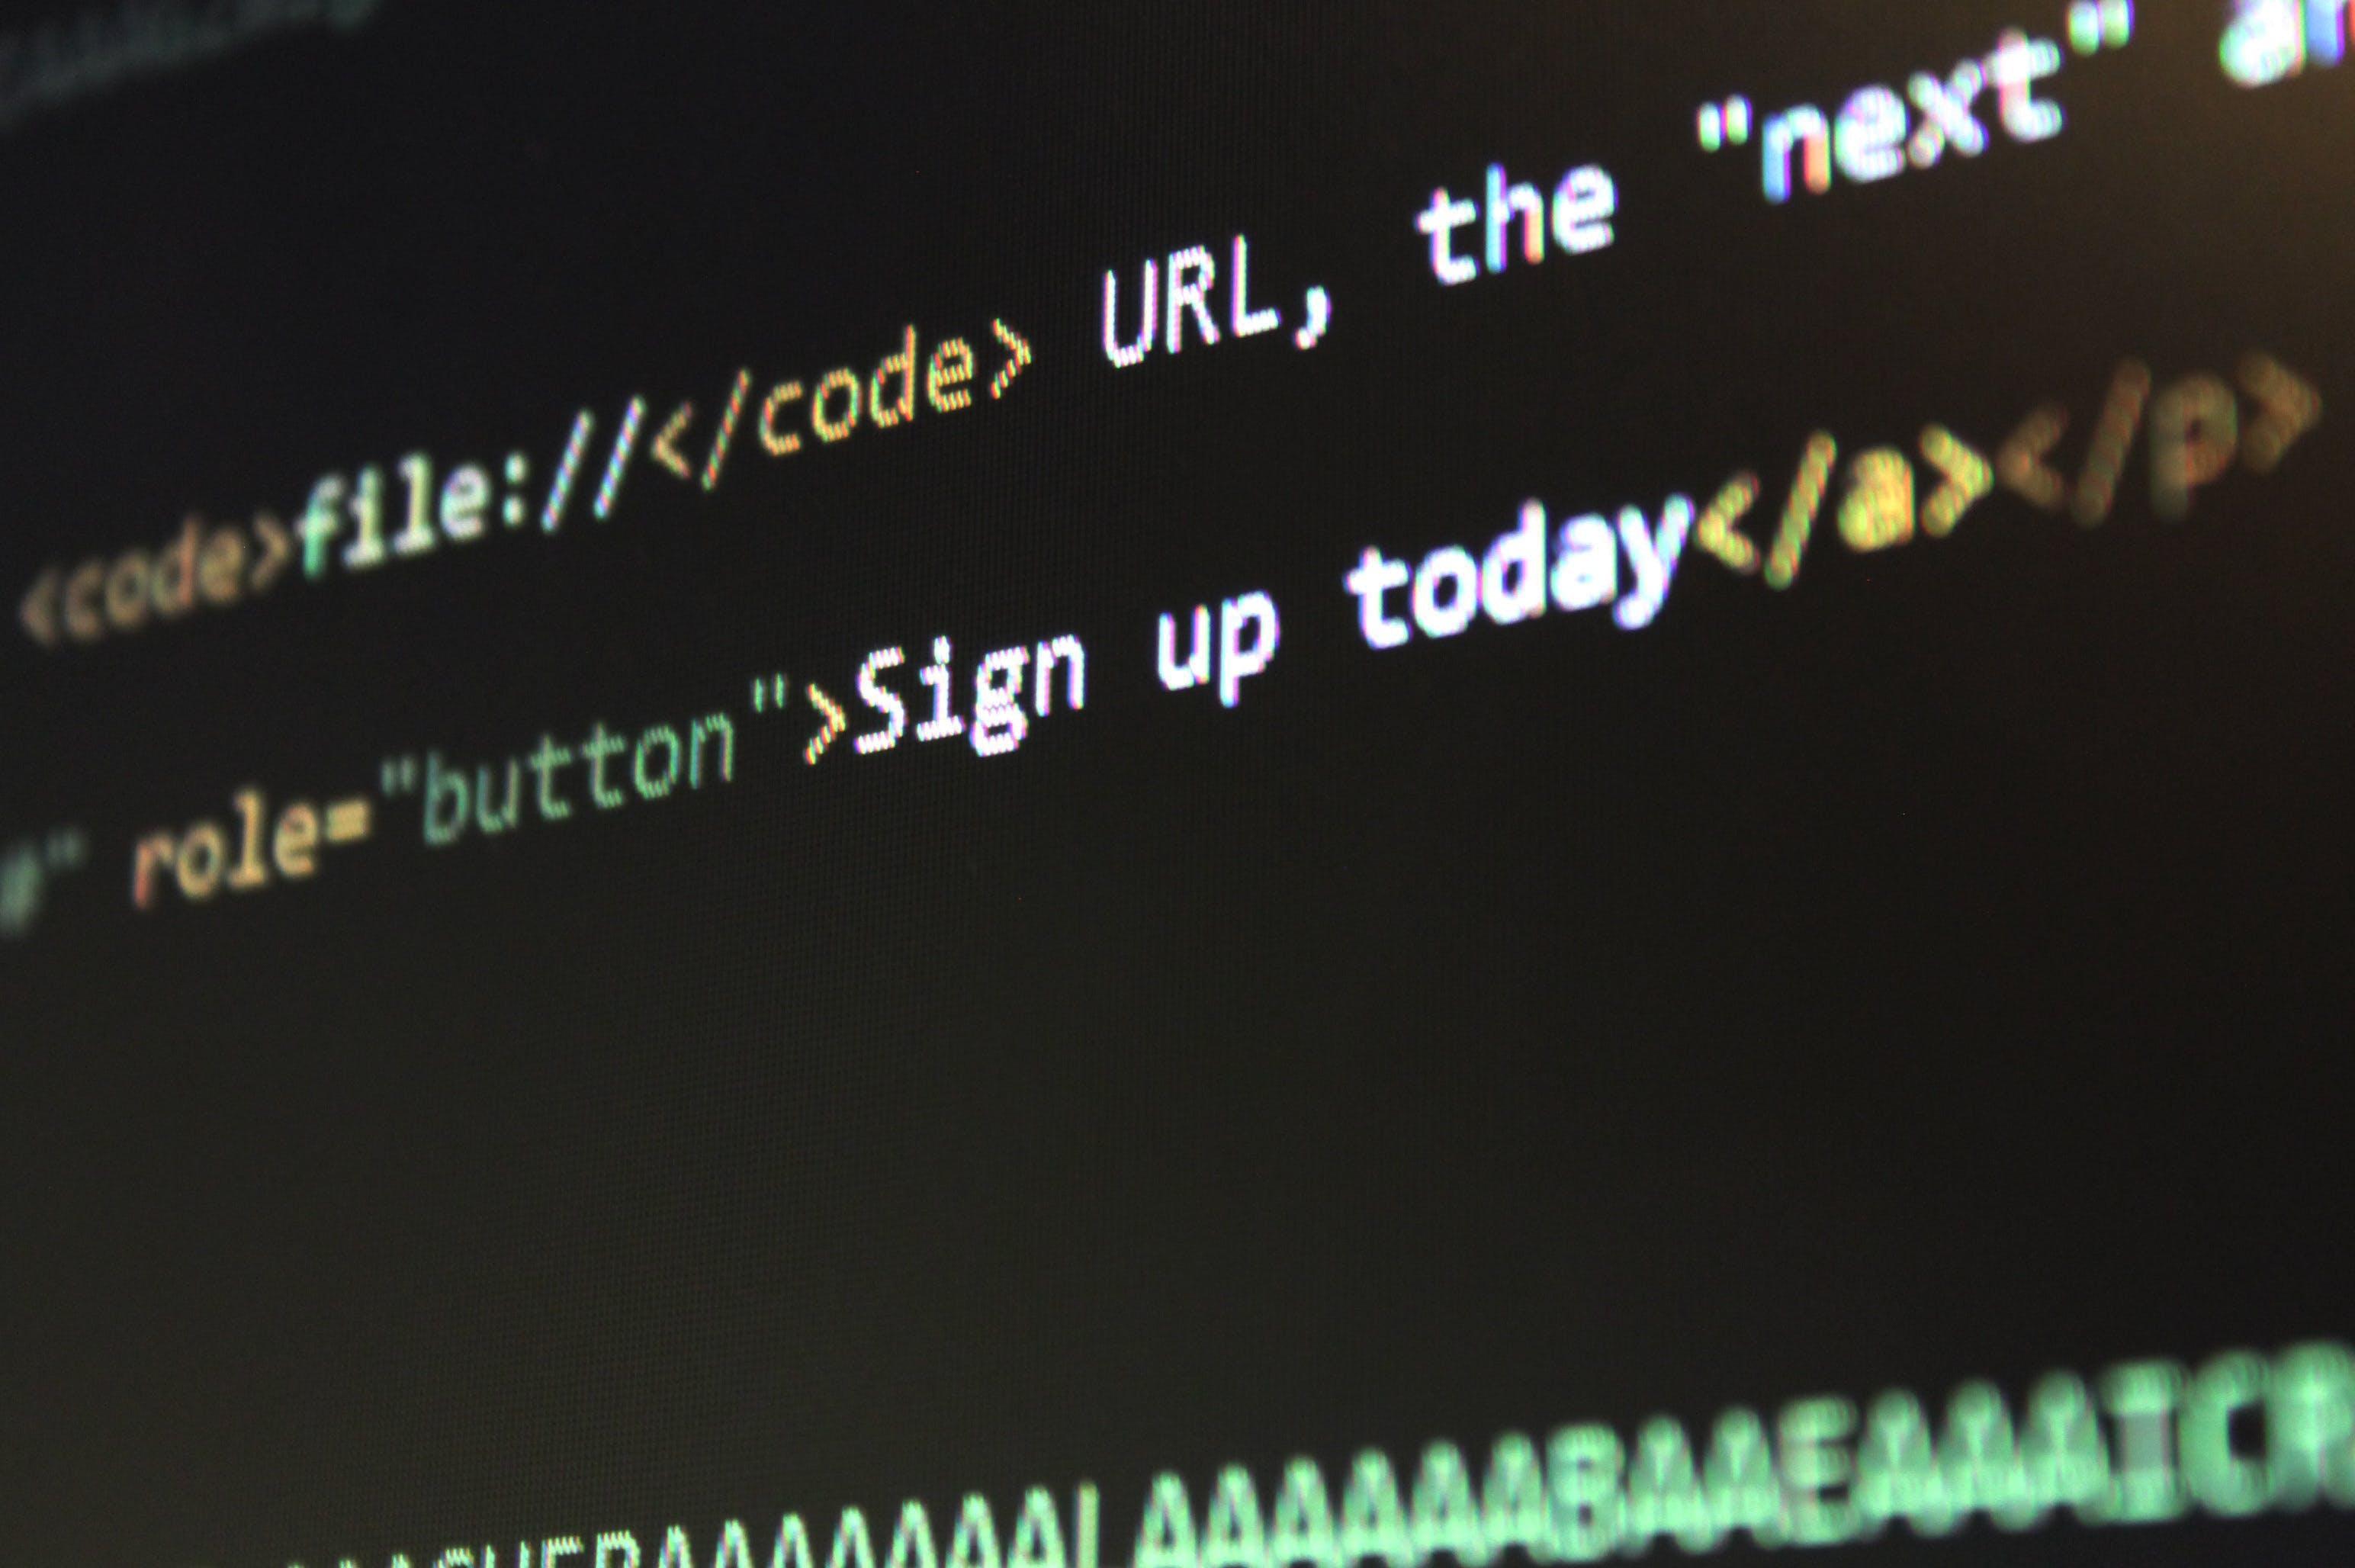 CSS, HTML, Web